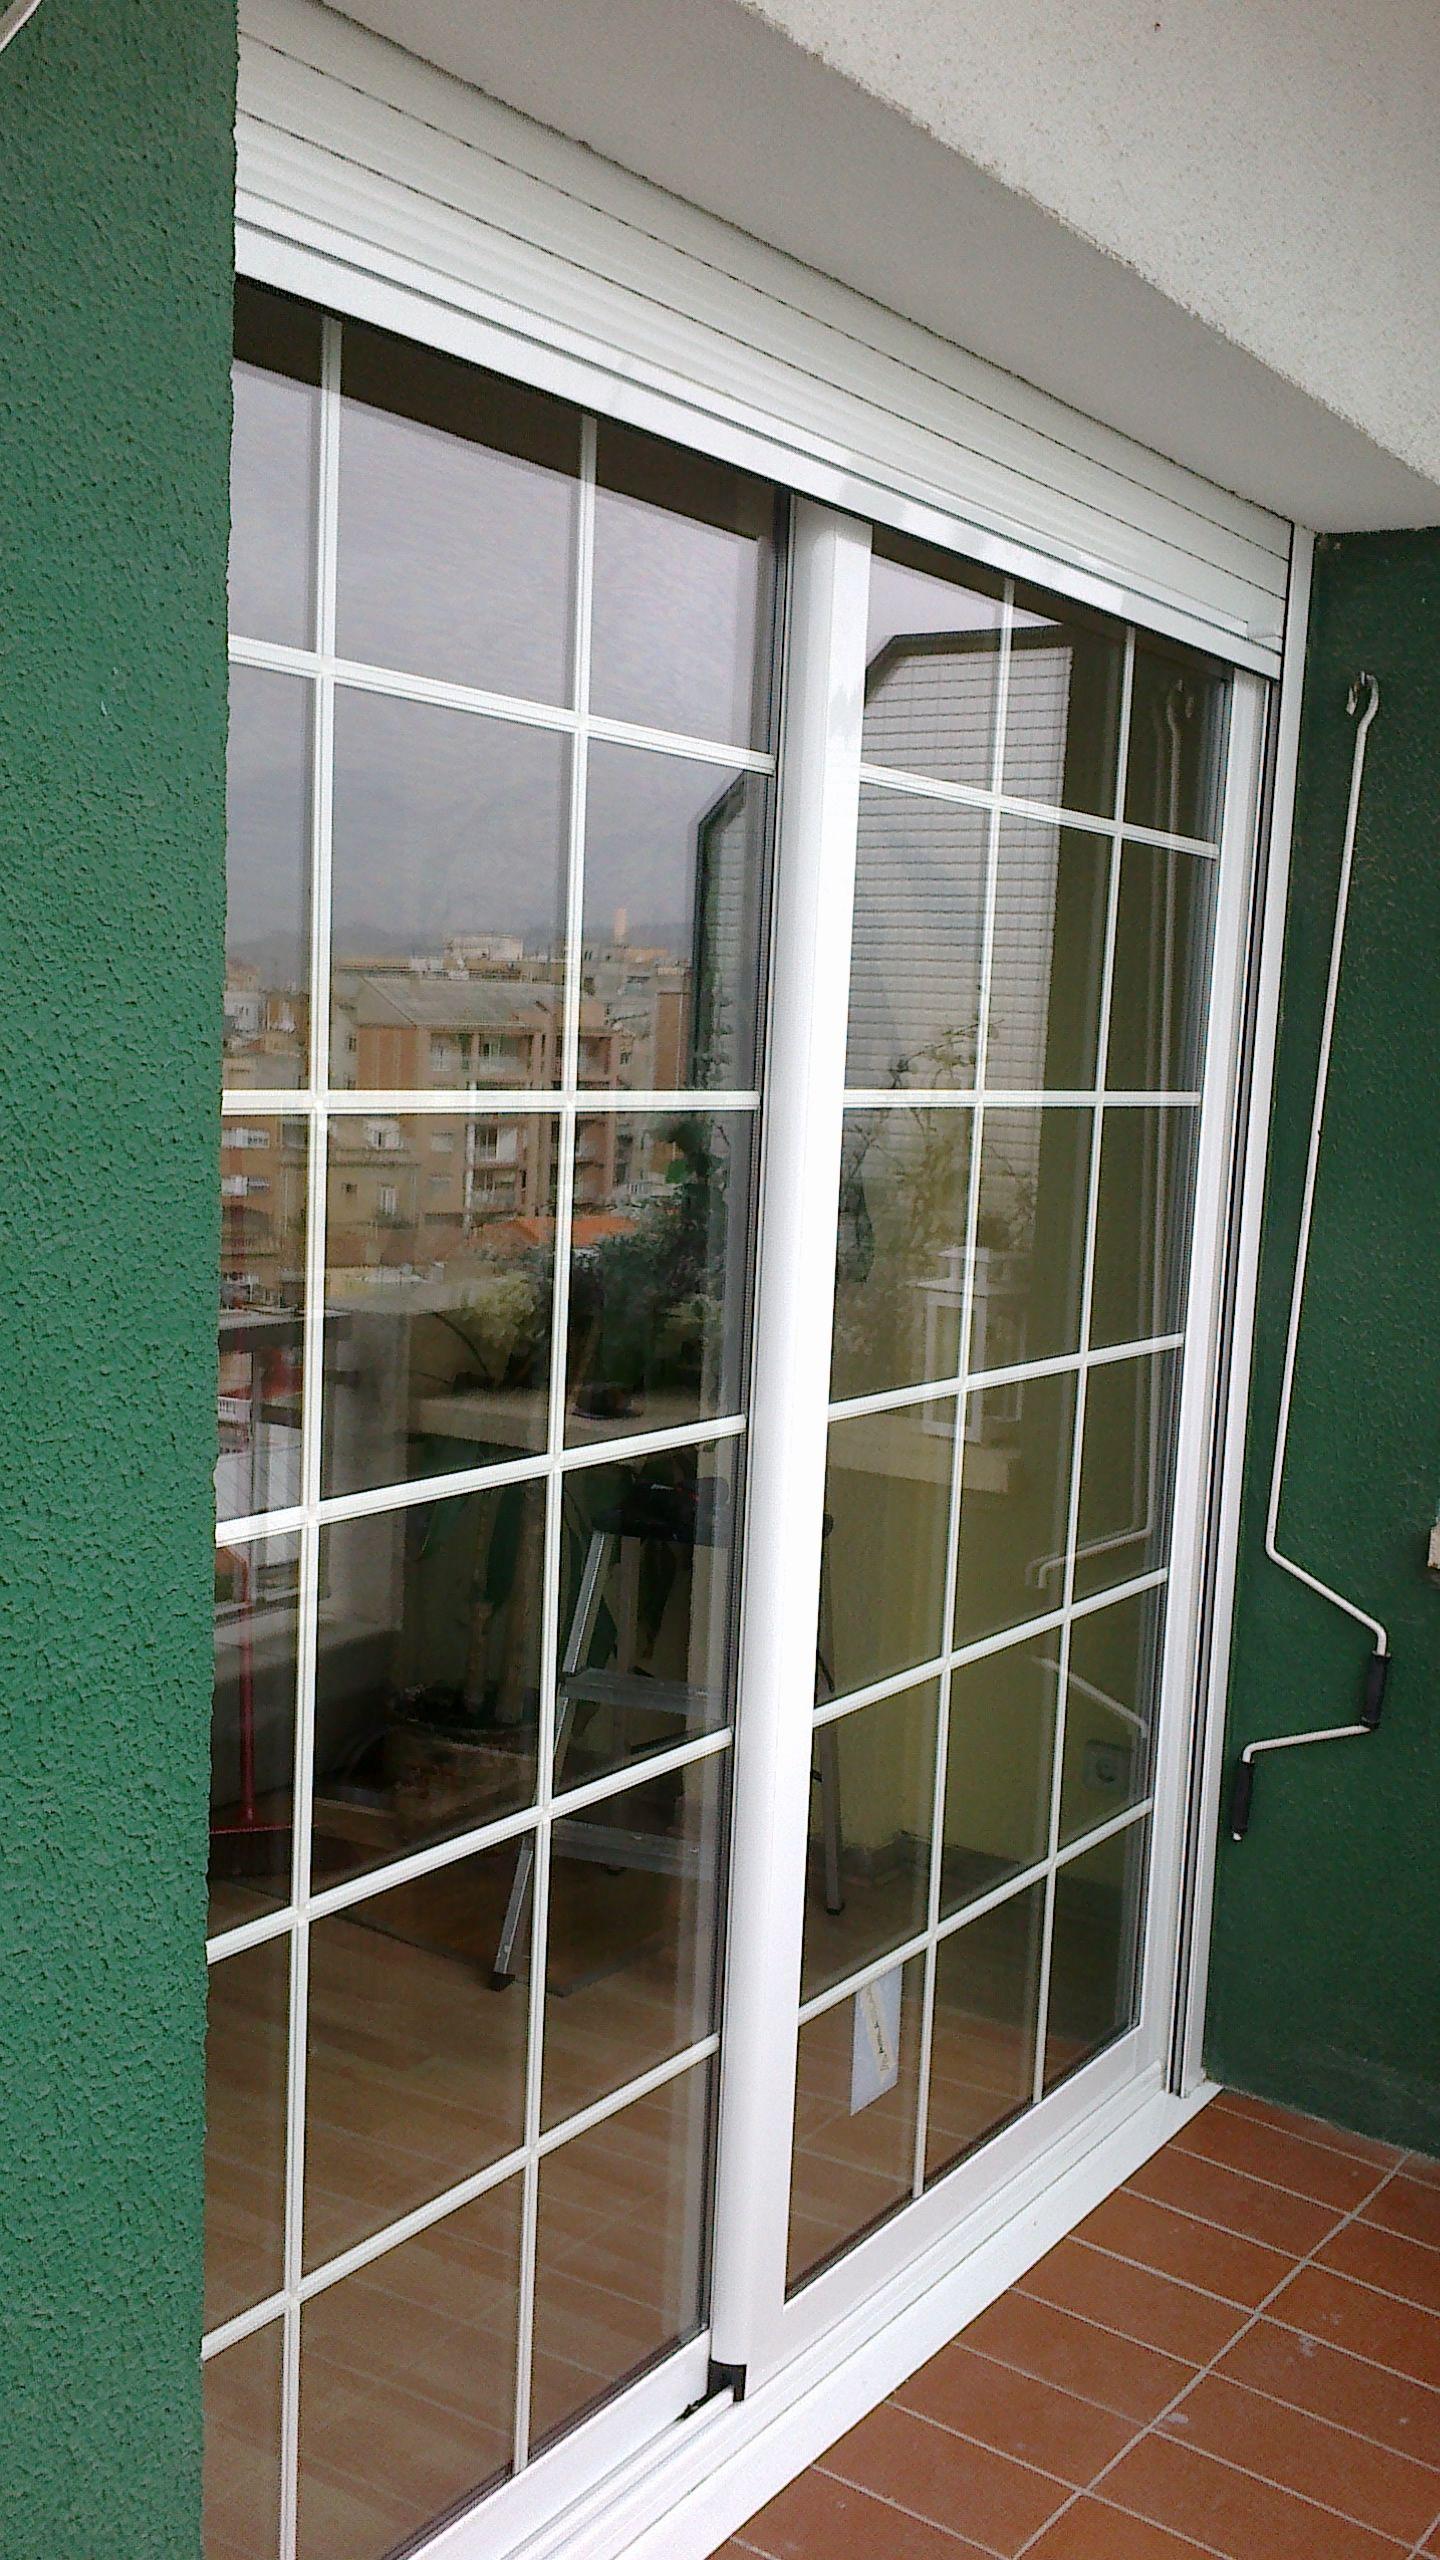 Foto 15 de carpinter a de aluminio met lica y pvc en barcelona vicar - Puerta terraza ...